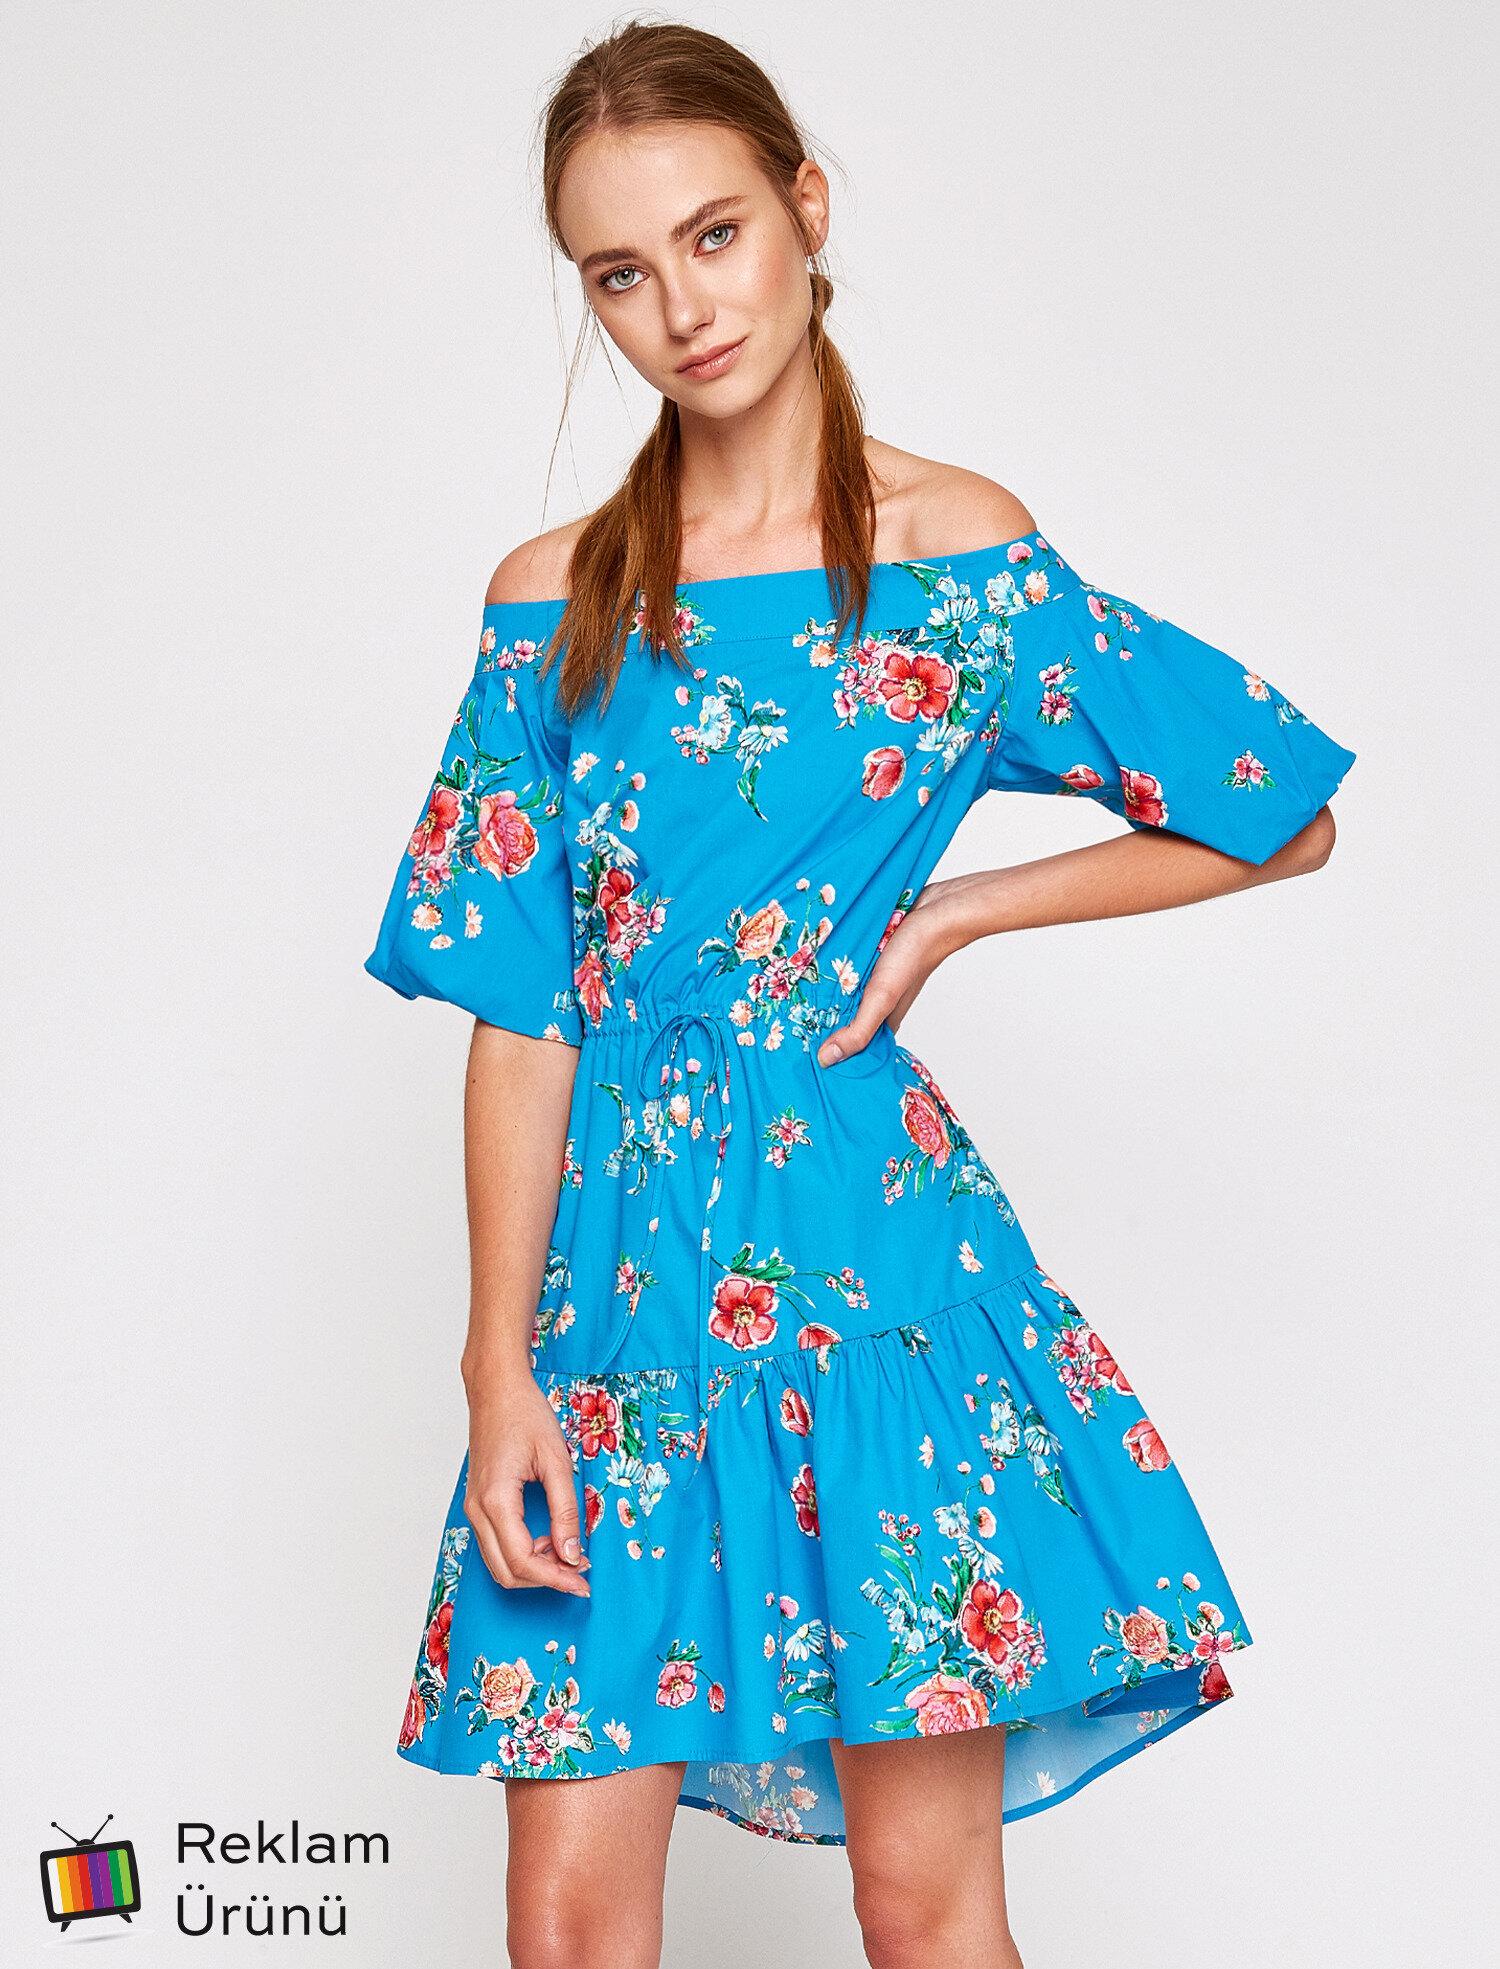 ef8f31a2cfa98 Mavi Bayan Çiçekli Elbise 7YAK88150PW03V | Koton